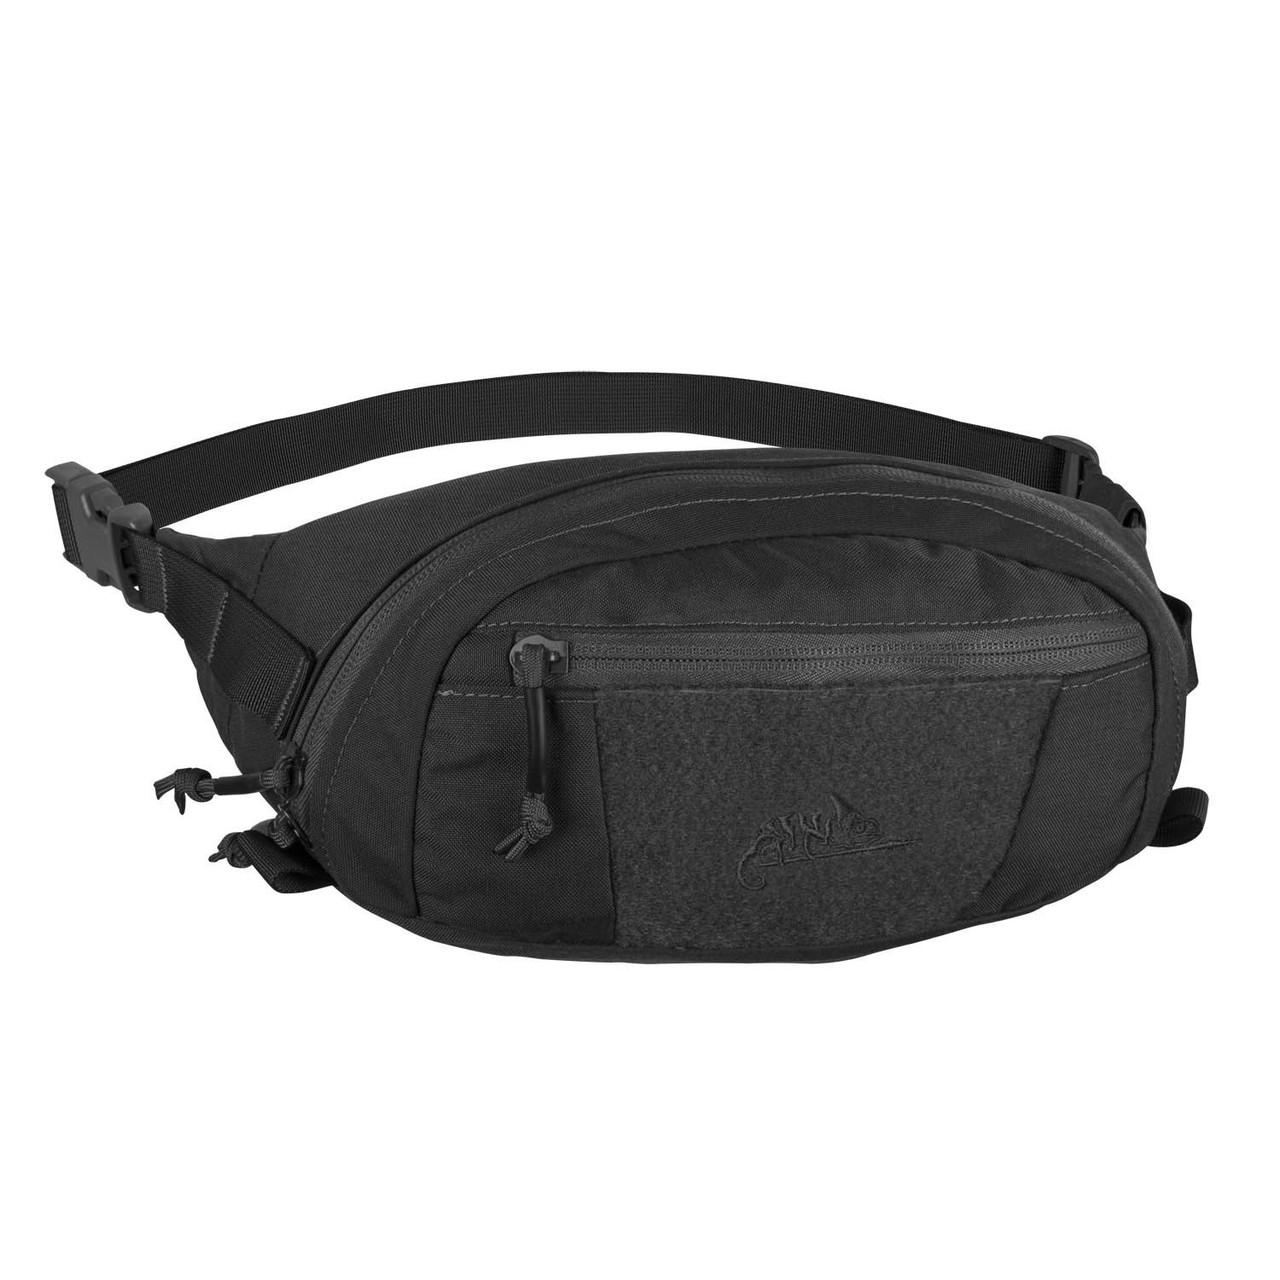 Сумка поясная Helikon-Tex® BANDICOOT® Waist Pack - Cordura® - Черная